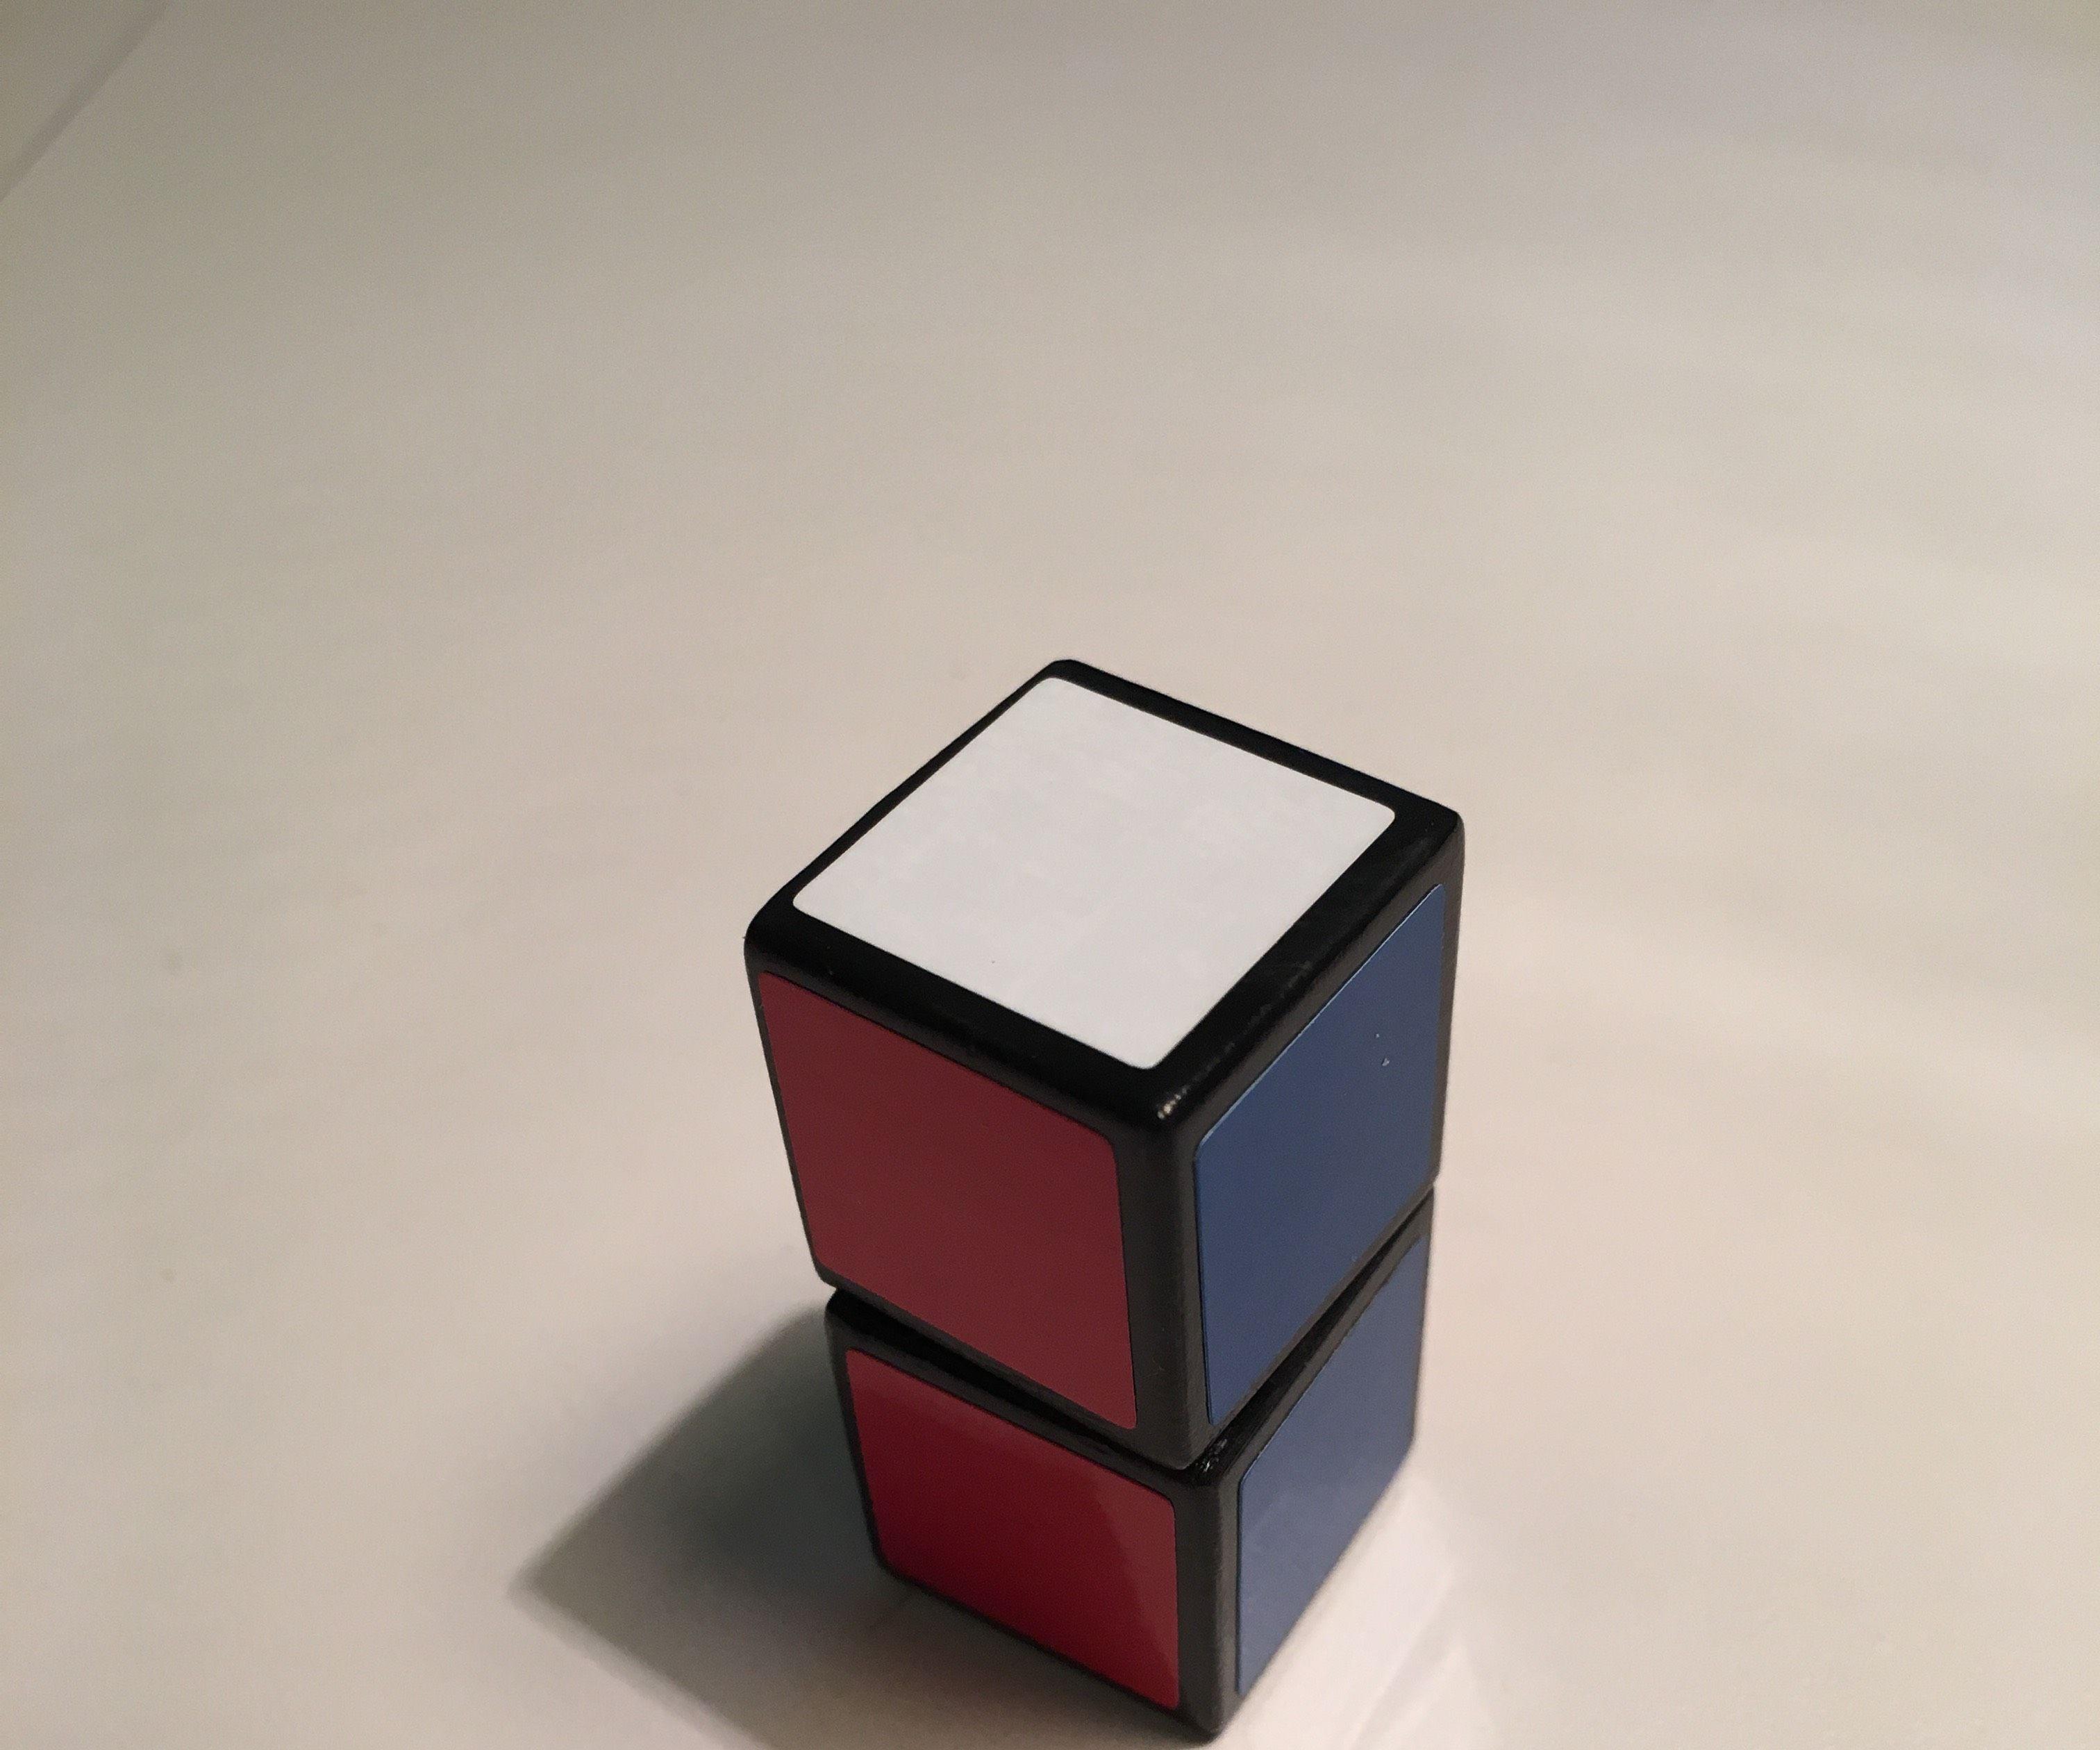 1x1x2 Rubik's Cube